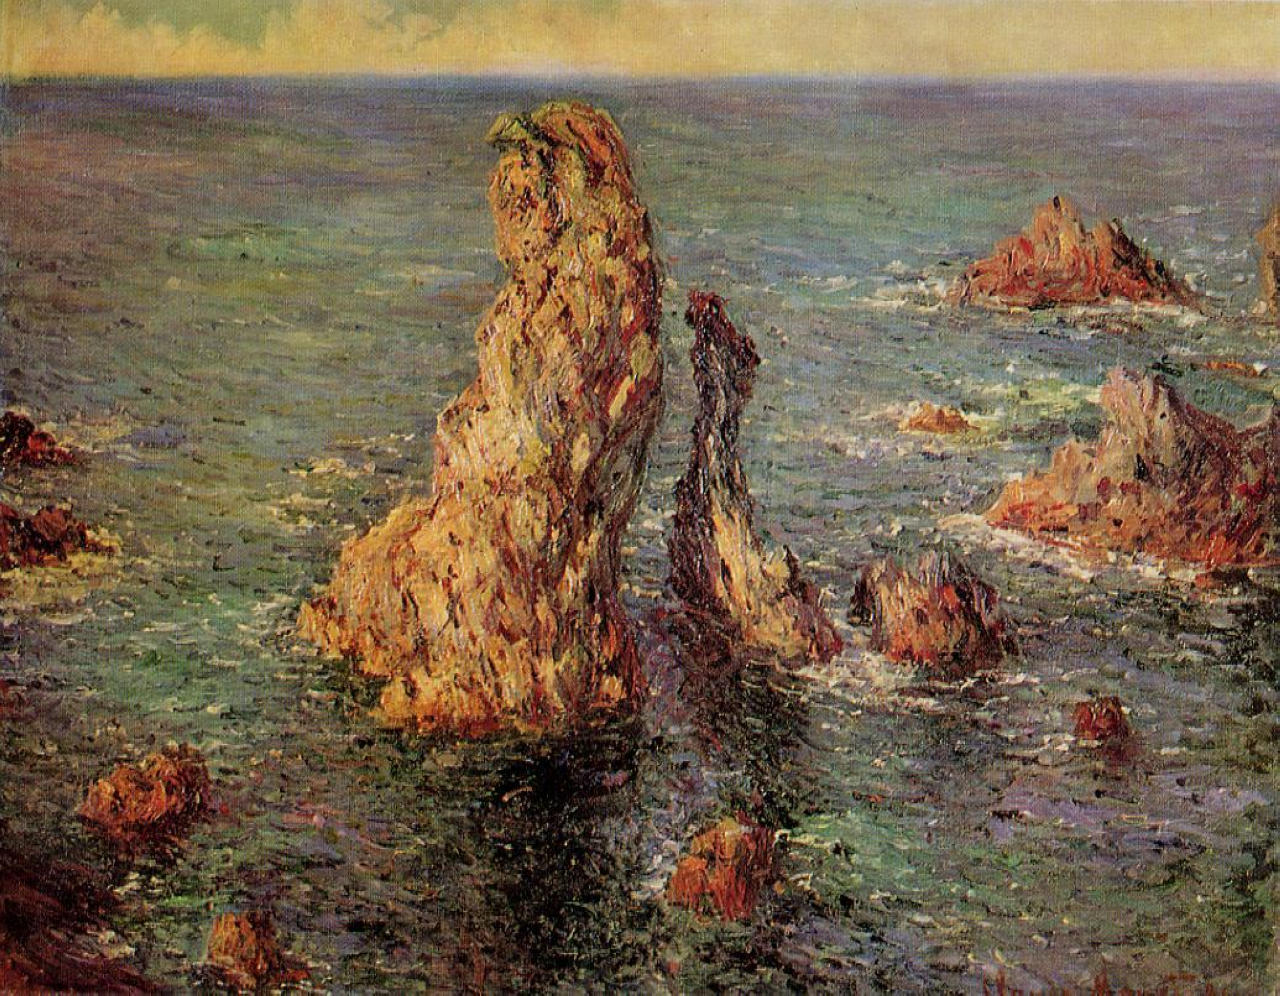 скалы и море < Пирамиды, порт Котон >:: Клод Моне, описание картины - Моне Клод (Claude Monet) фото